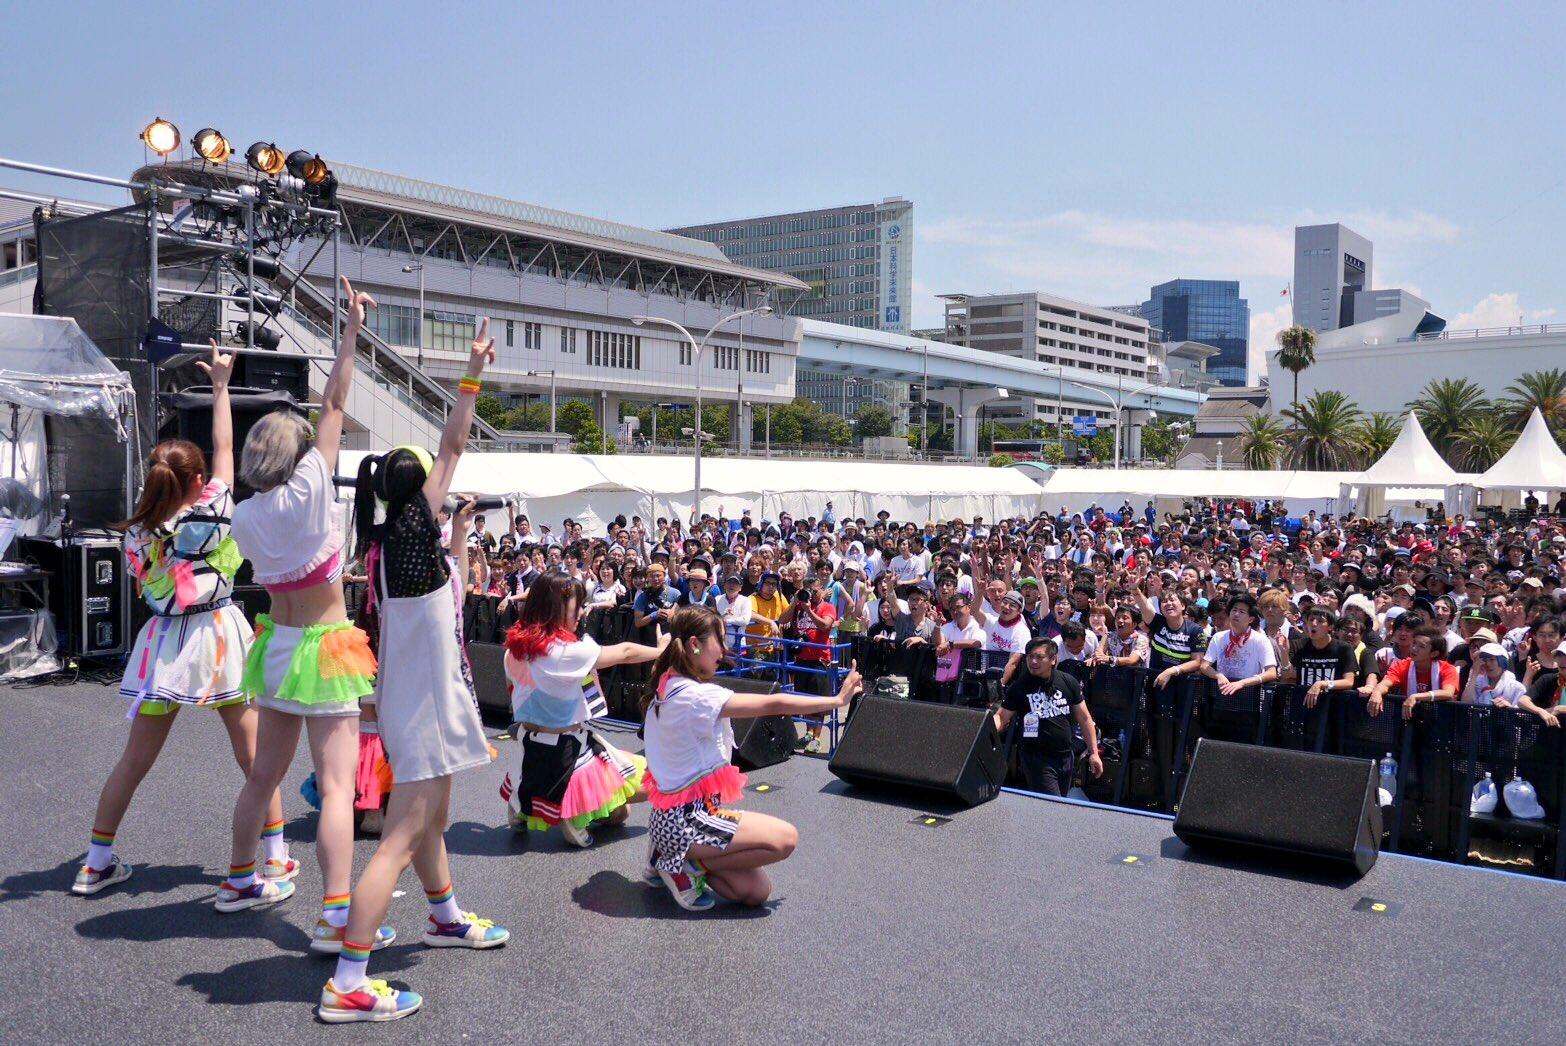 TIF2016 1日目 妄想キャリブレーション  @SHIP STAGE  #TIF2016 https://t.co/rFO2k5tIXe